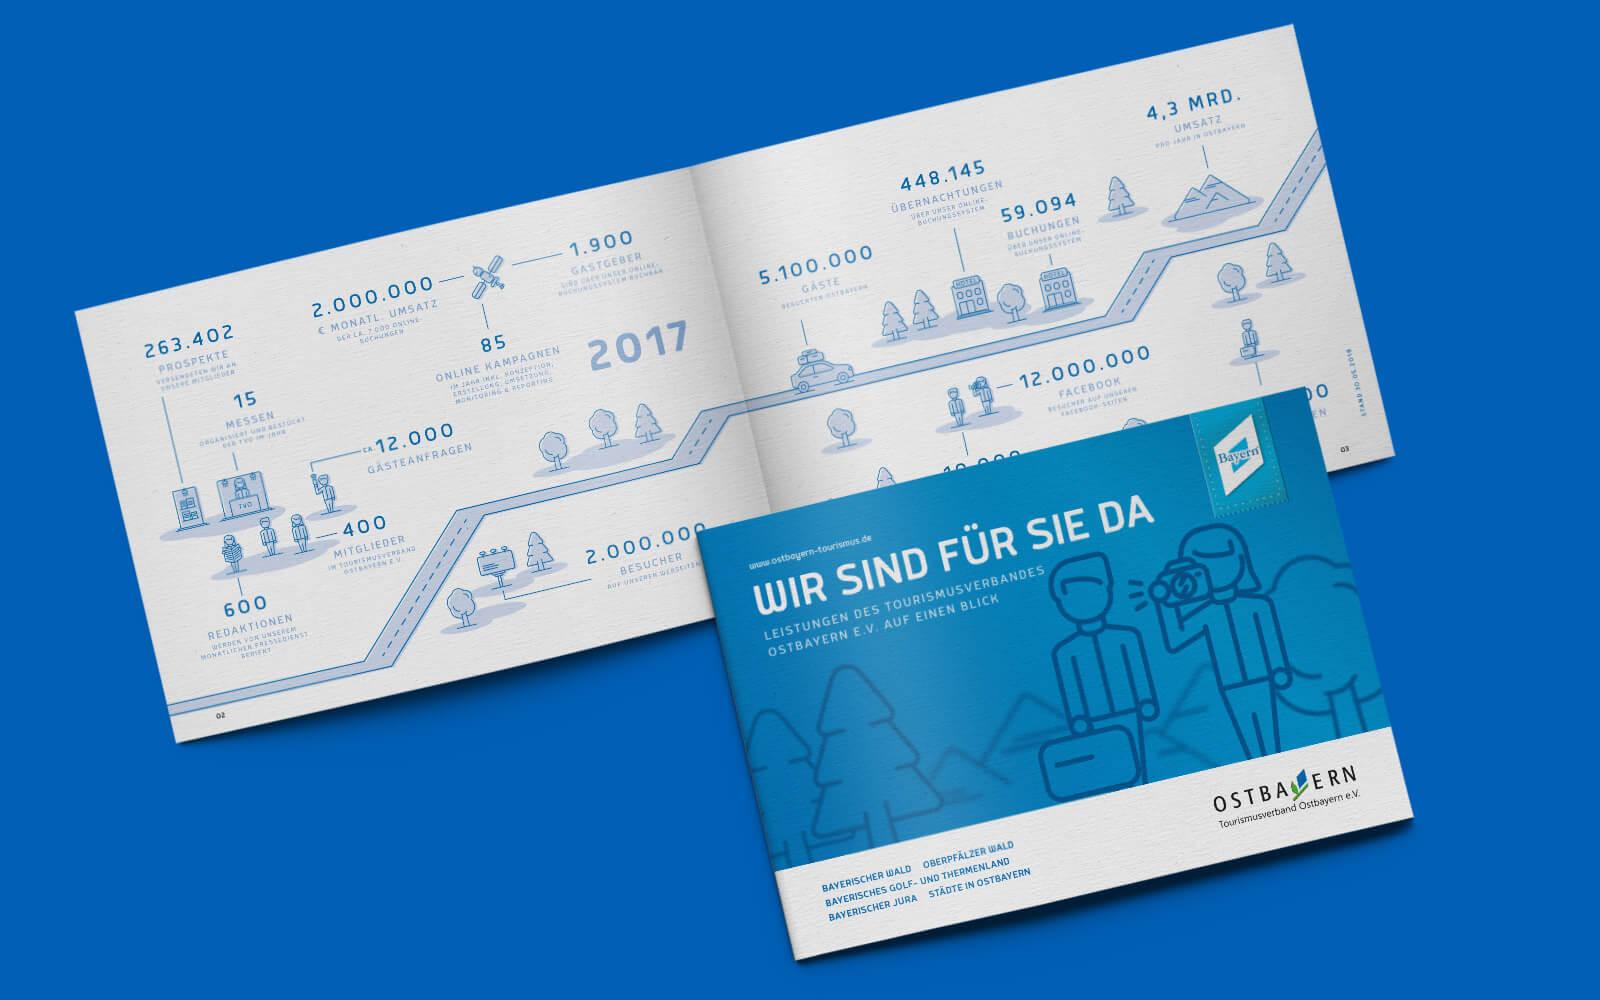 Ostbayern Tourismus – Imagebroschüre